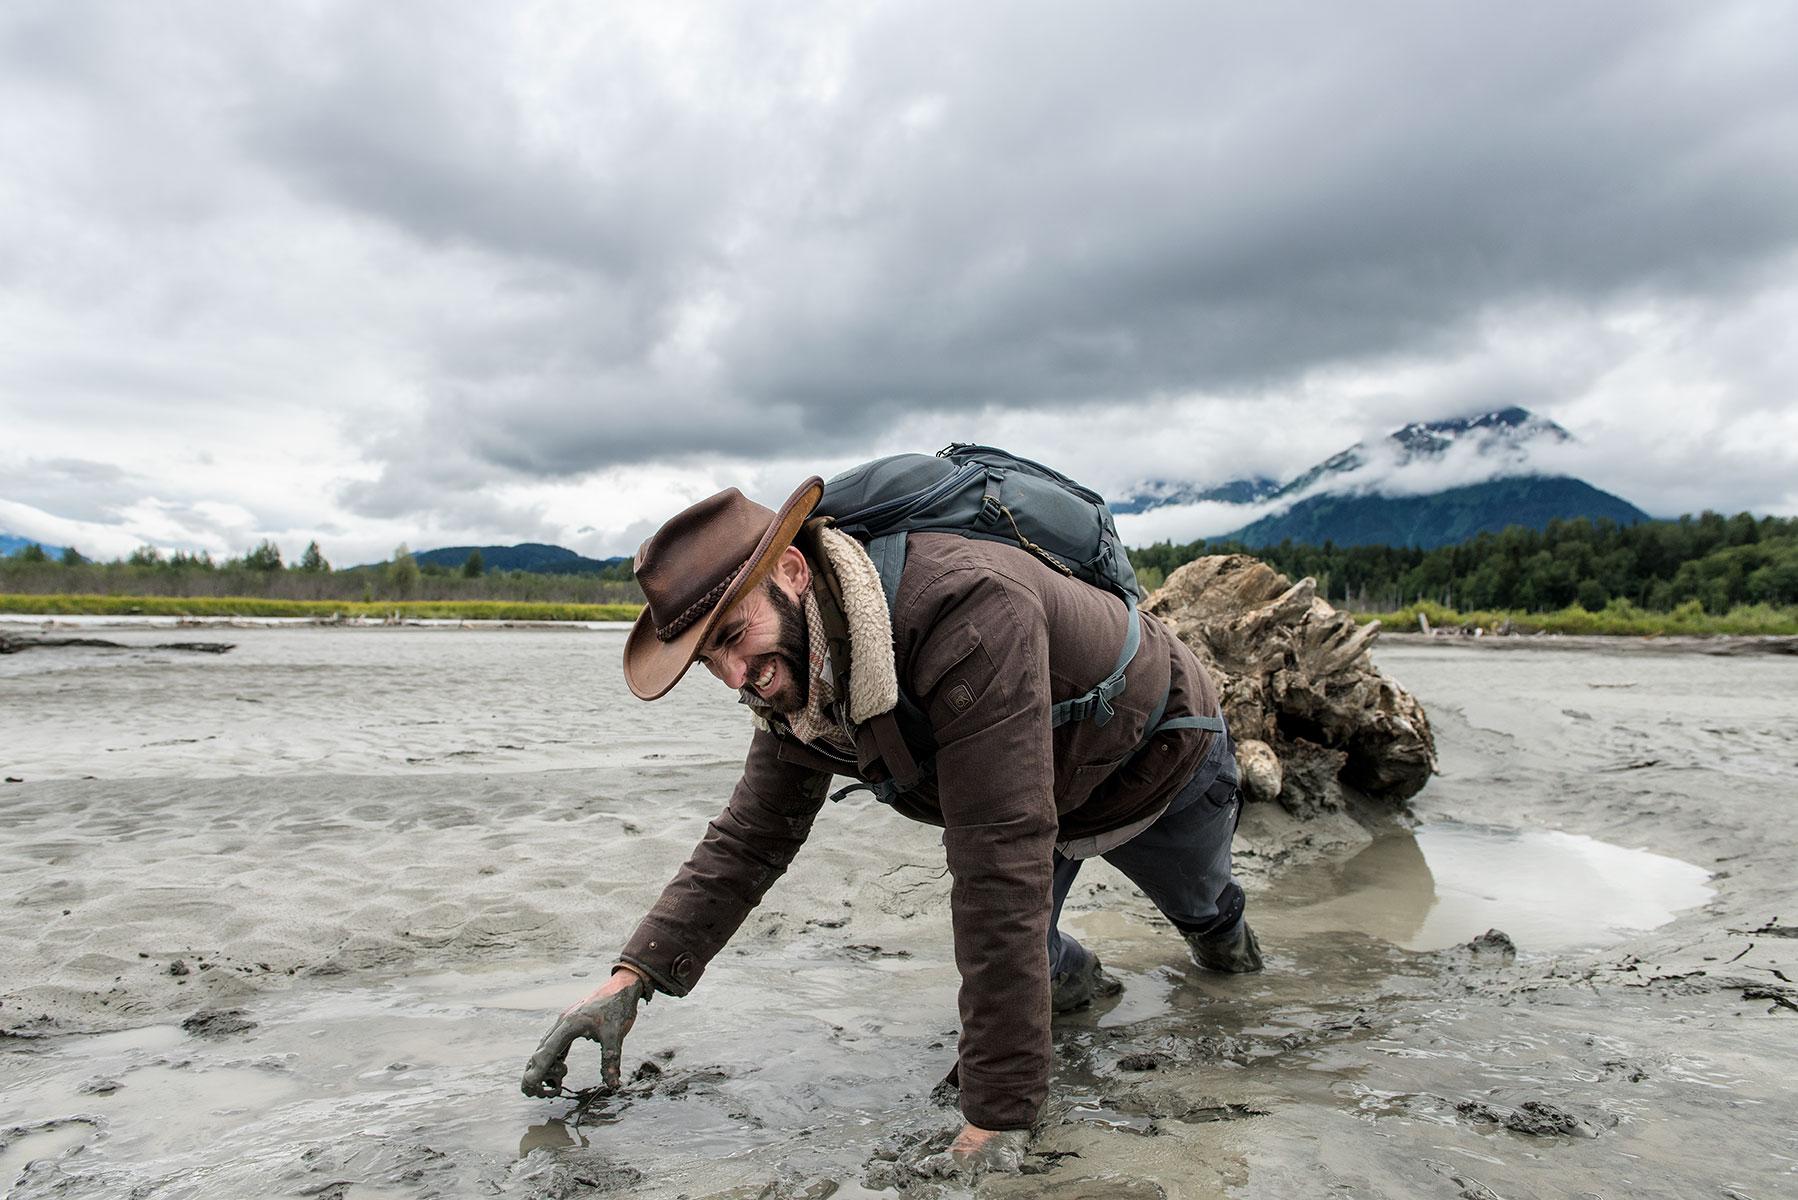 austin-trigg-brave-wilderness-alaska-BW-Coyote-Stuck-in-Mud.jpg